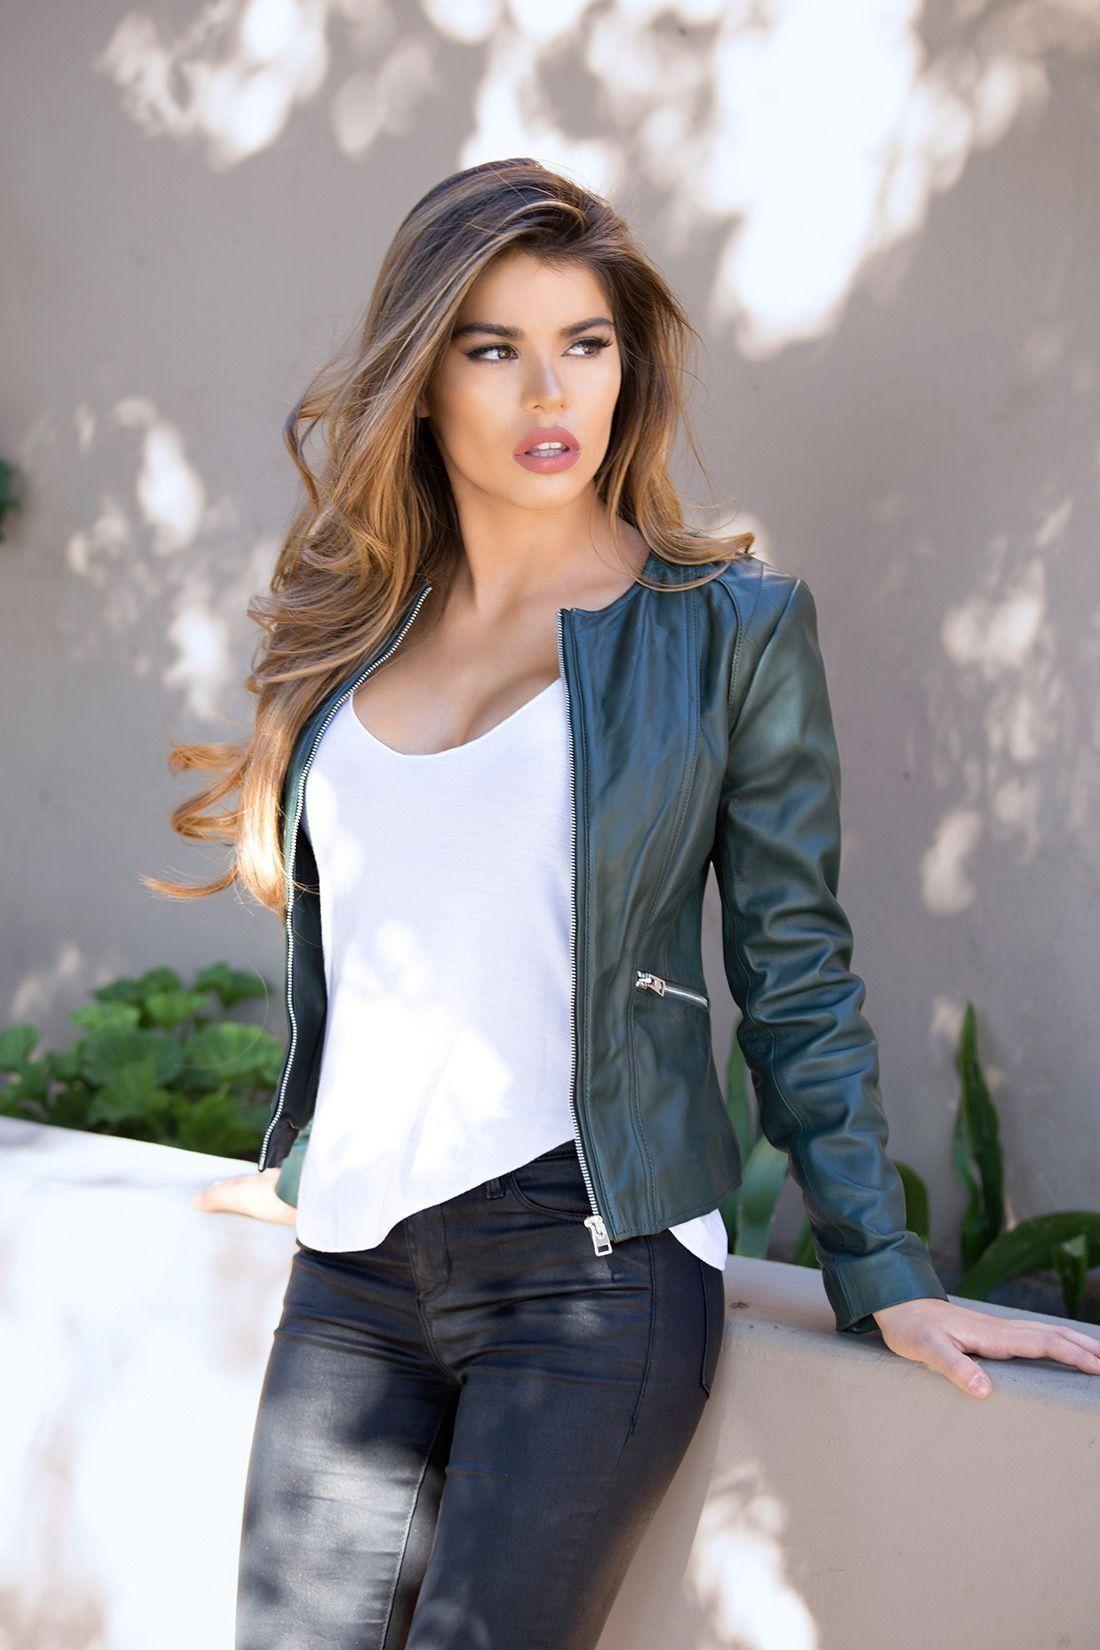 44 Graceful Leather Jacket Ideas For Woman Vis Wed Green Leather Jackets Green Leather Jacket Outfit Leather Jackets Women [ 1650 x 1100 Pixel ]